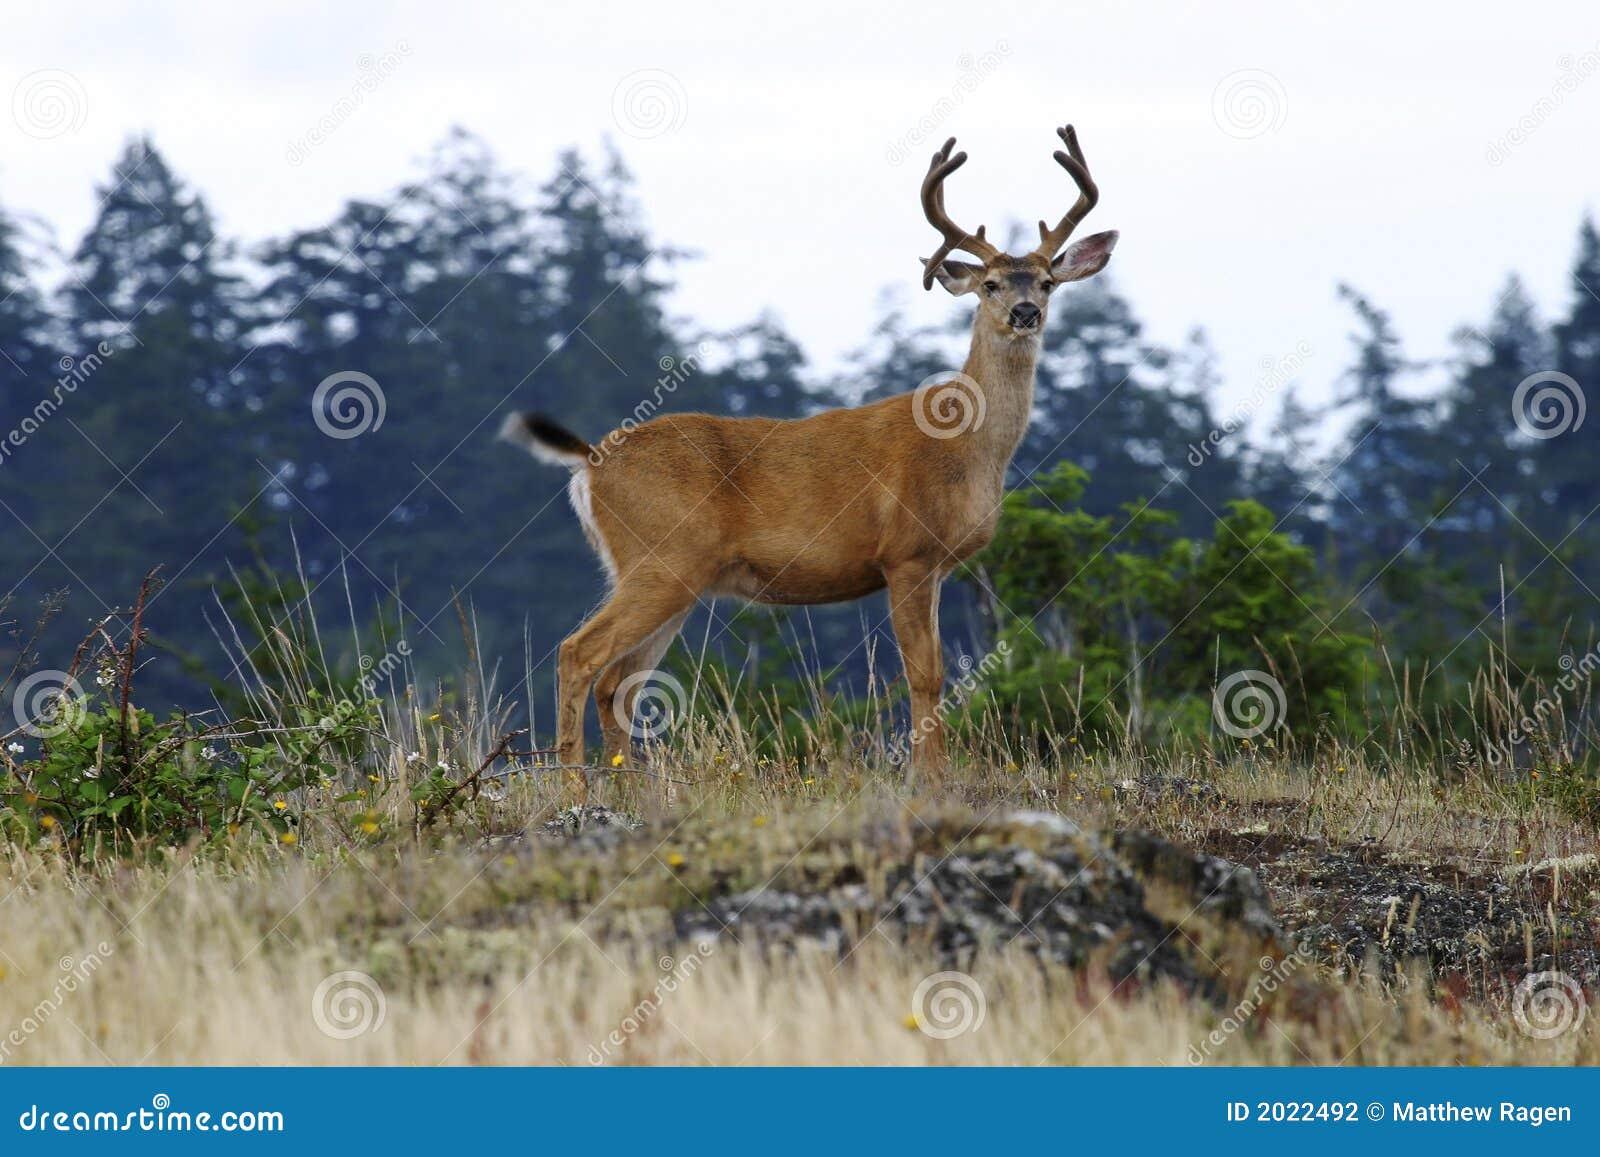 Buck Deer With Antlers